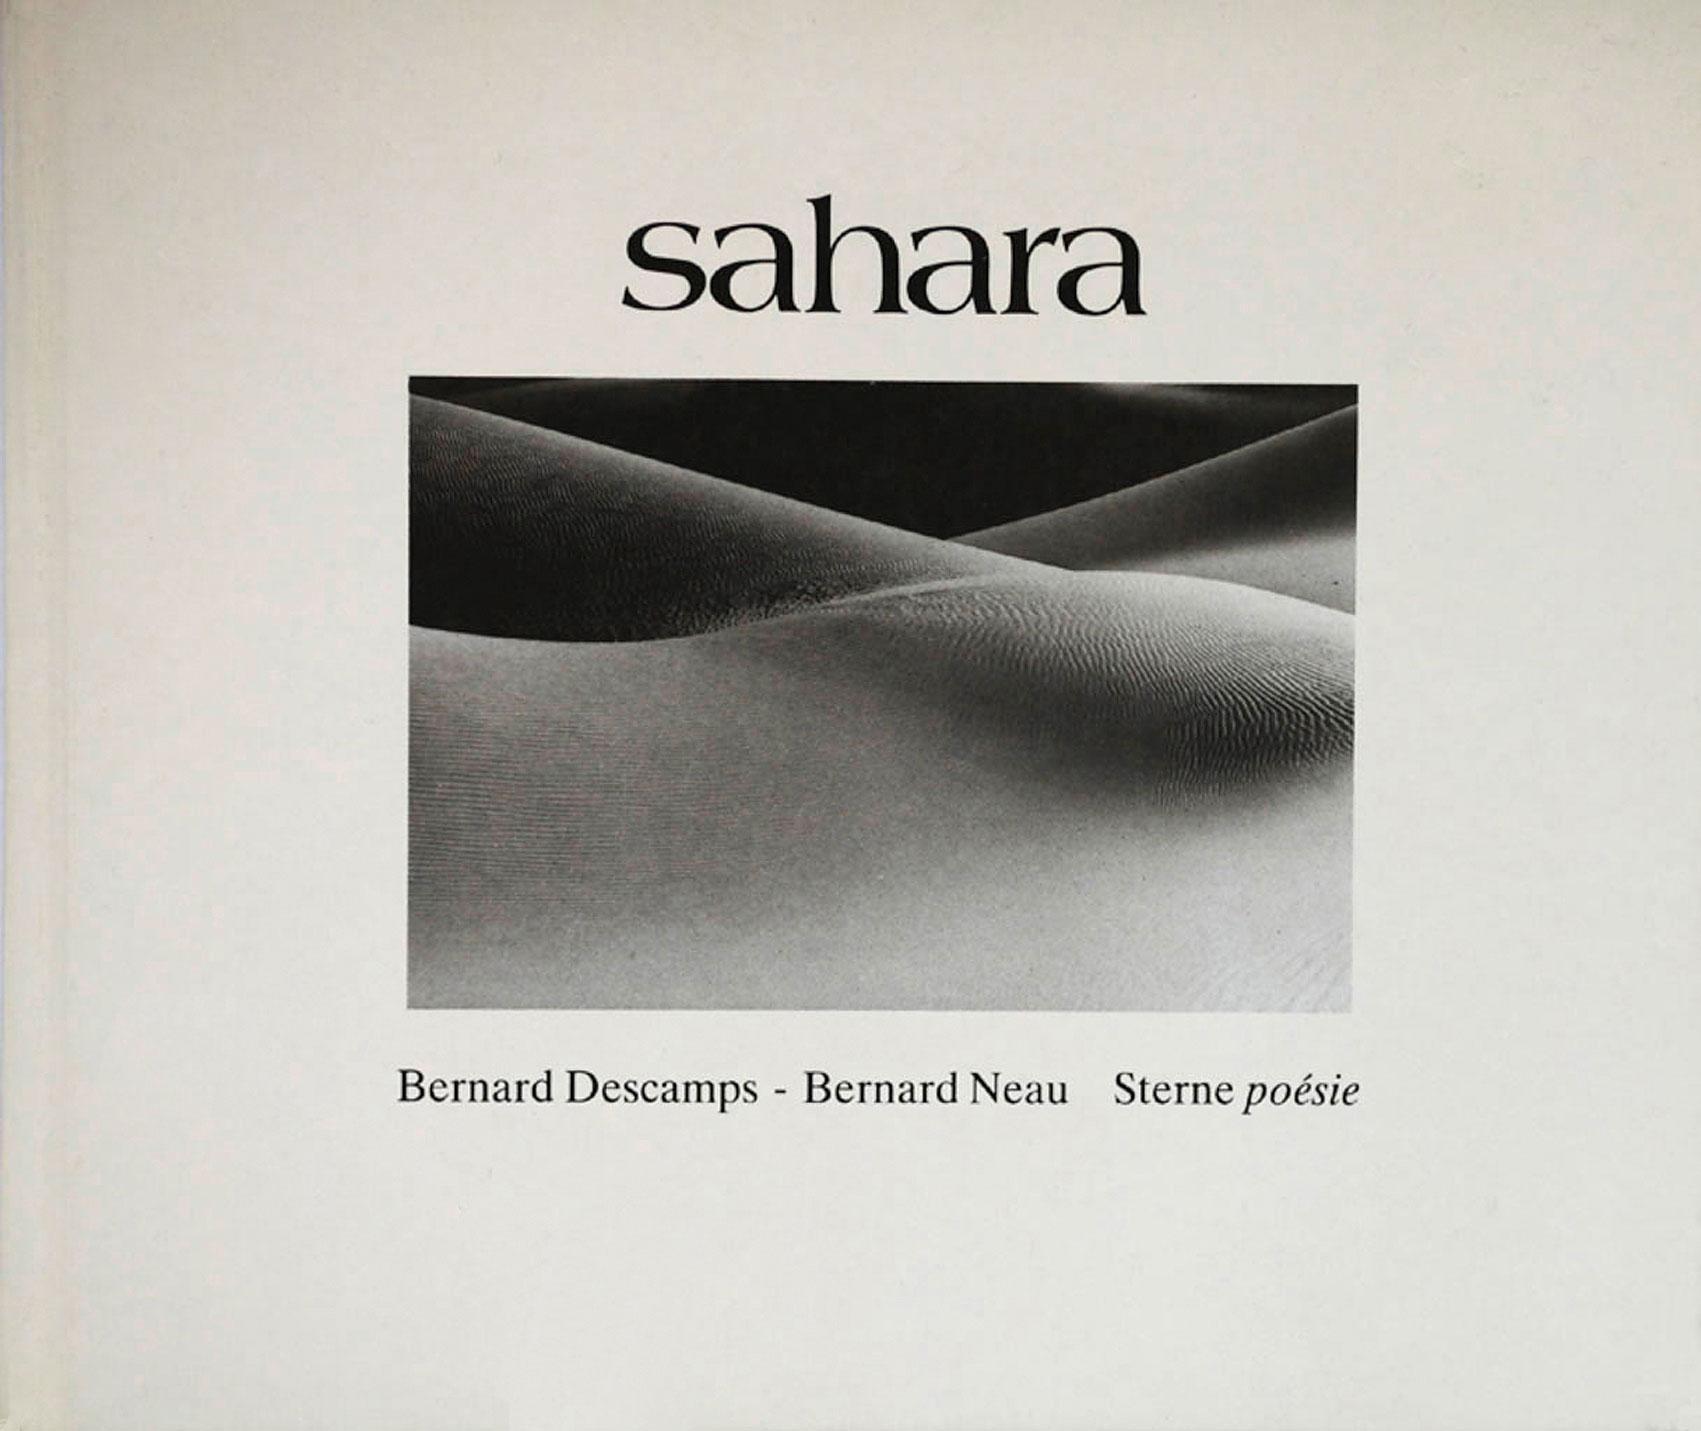 Sahara – Bernard Descamps (phtographie) & Bernard Neau (texte), STERNE poésie, 1985